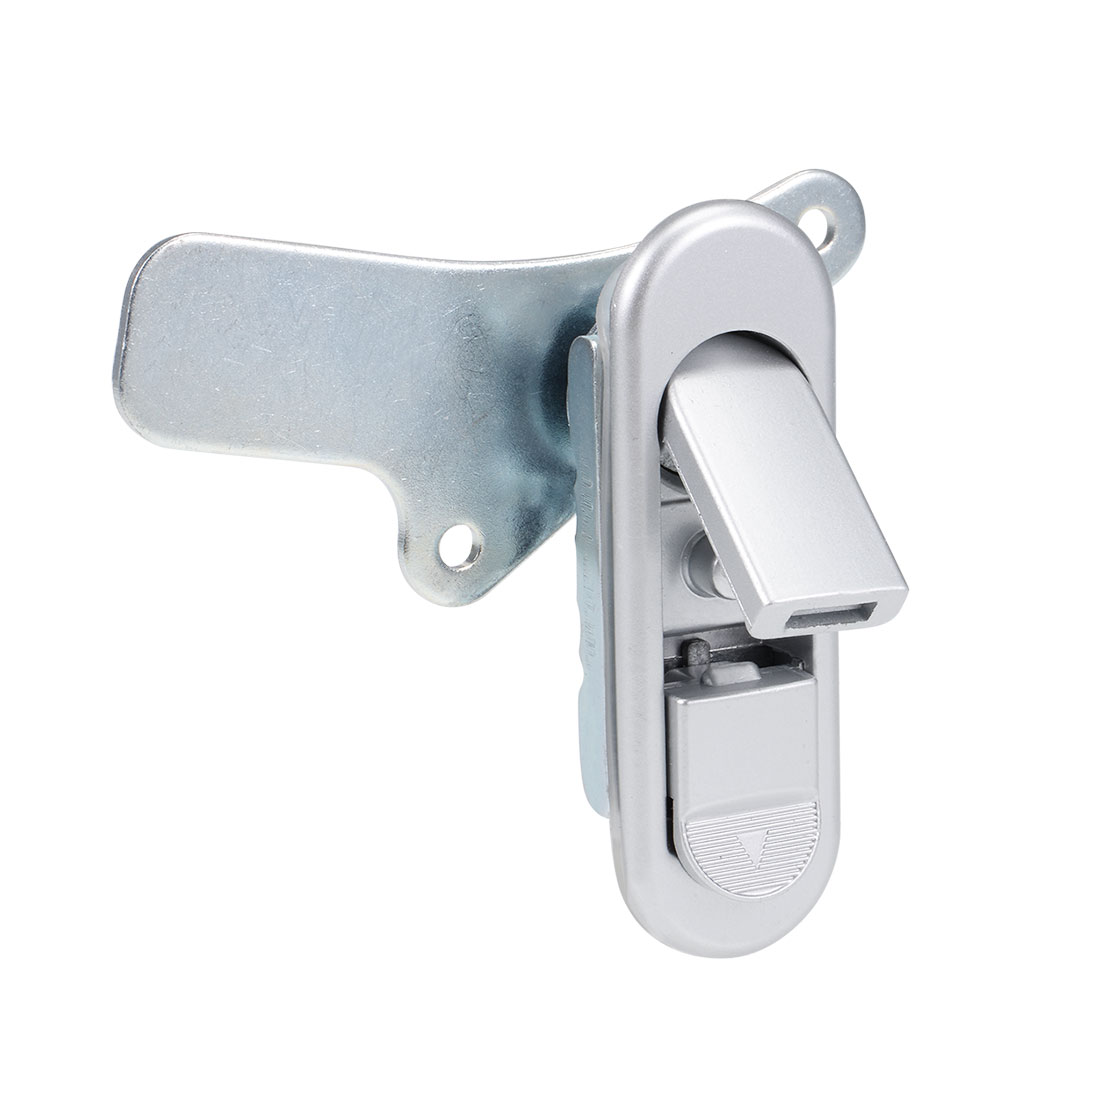 Electric Cabinet Panel Cam Lock Push Button Pop Up Type Door Lock Keyless